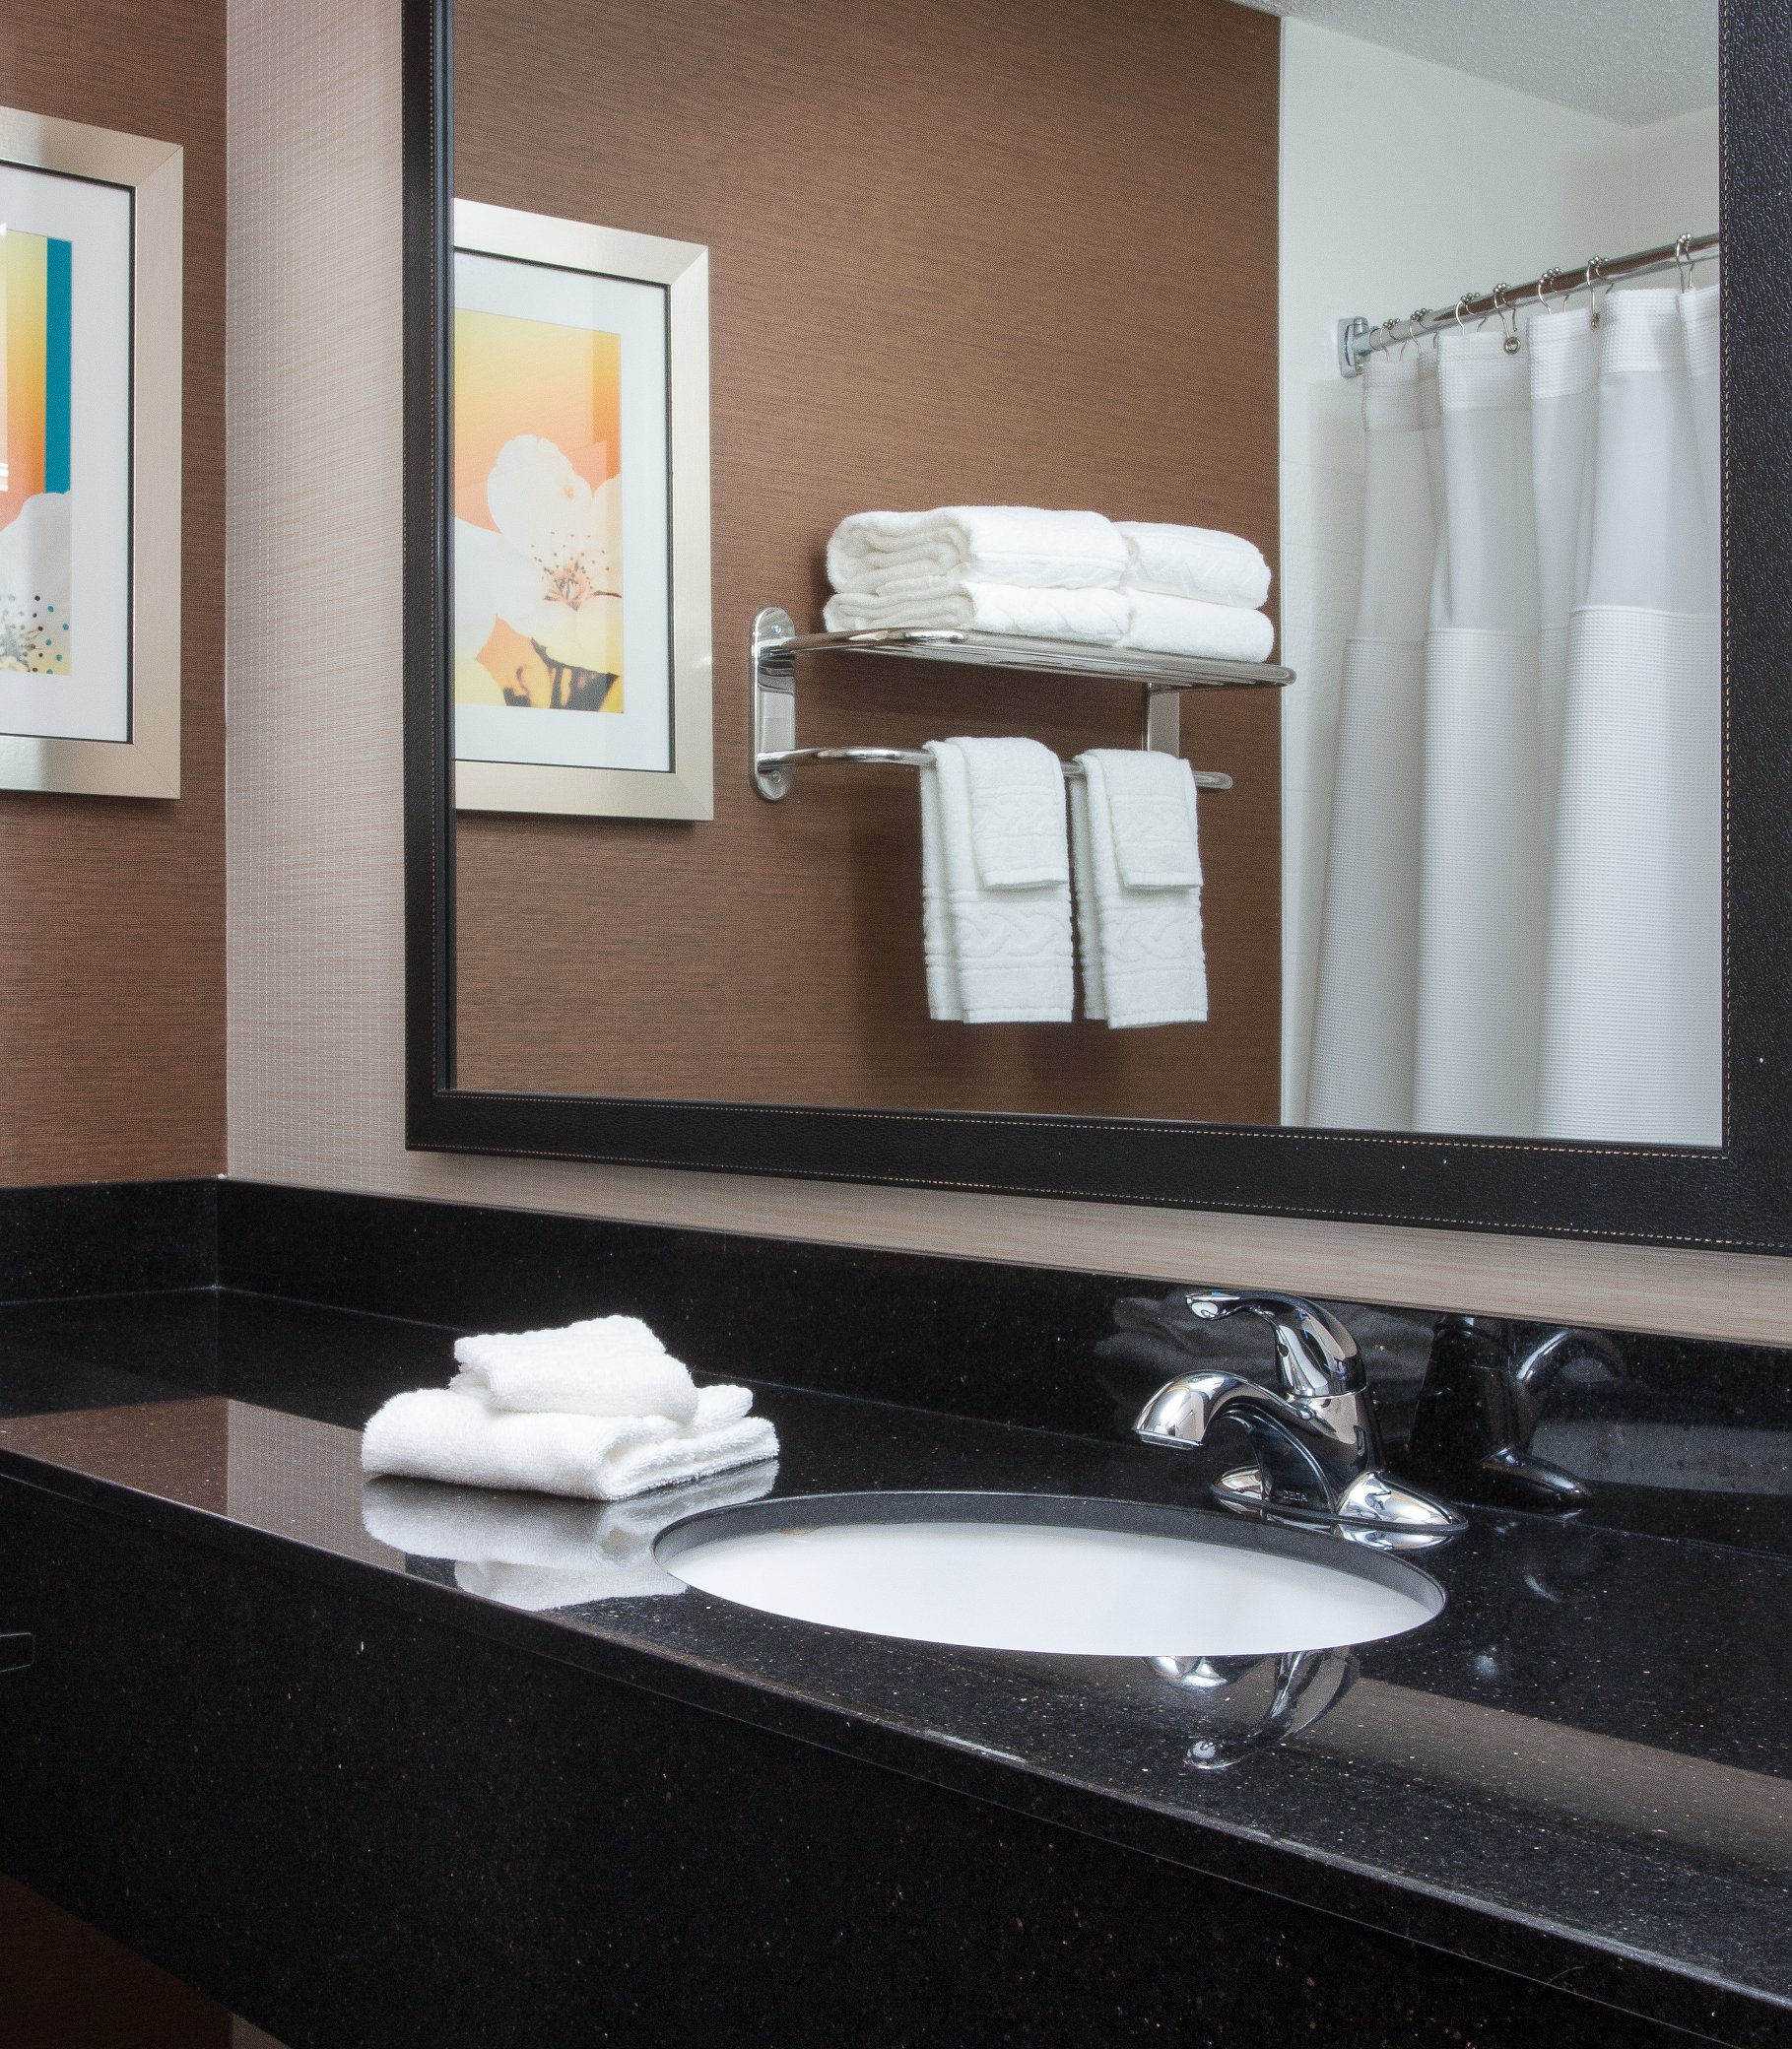 Fairfield Inn & Suites by Marriott Cheyenne image 10